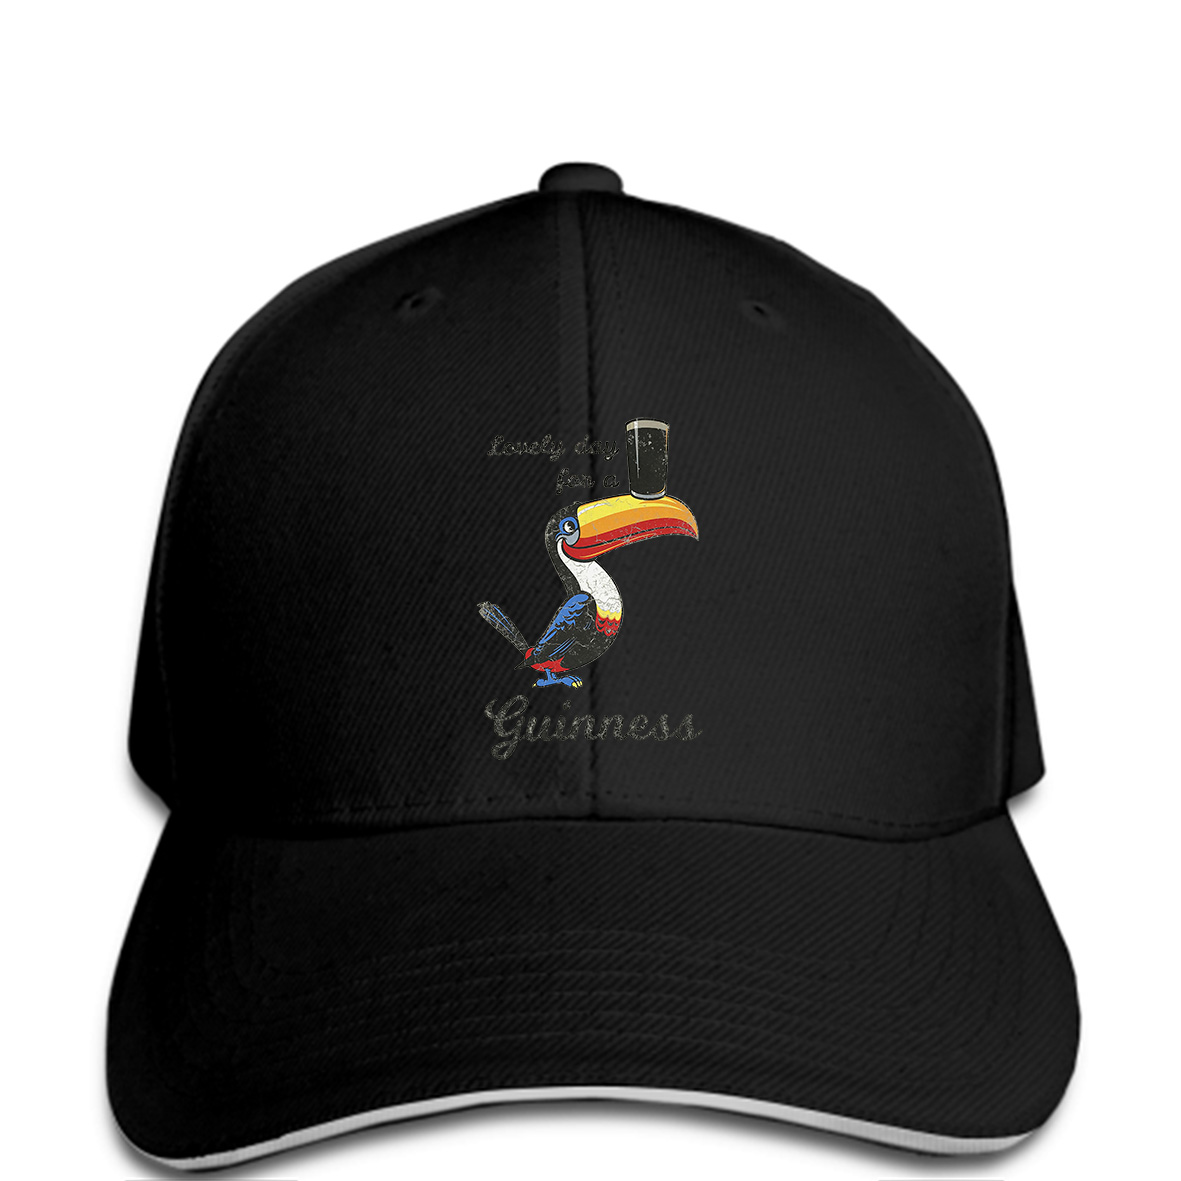 078571071 US $9.9 |Men Baseball cap Lovely Day Guinness funny Hat novelty tsnapback  women-in Men's Baseball Caps from Apparel Accessories on Aliexpress.com |  ...